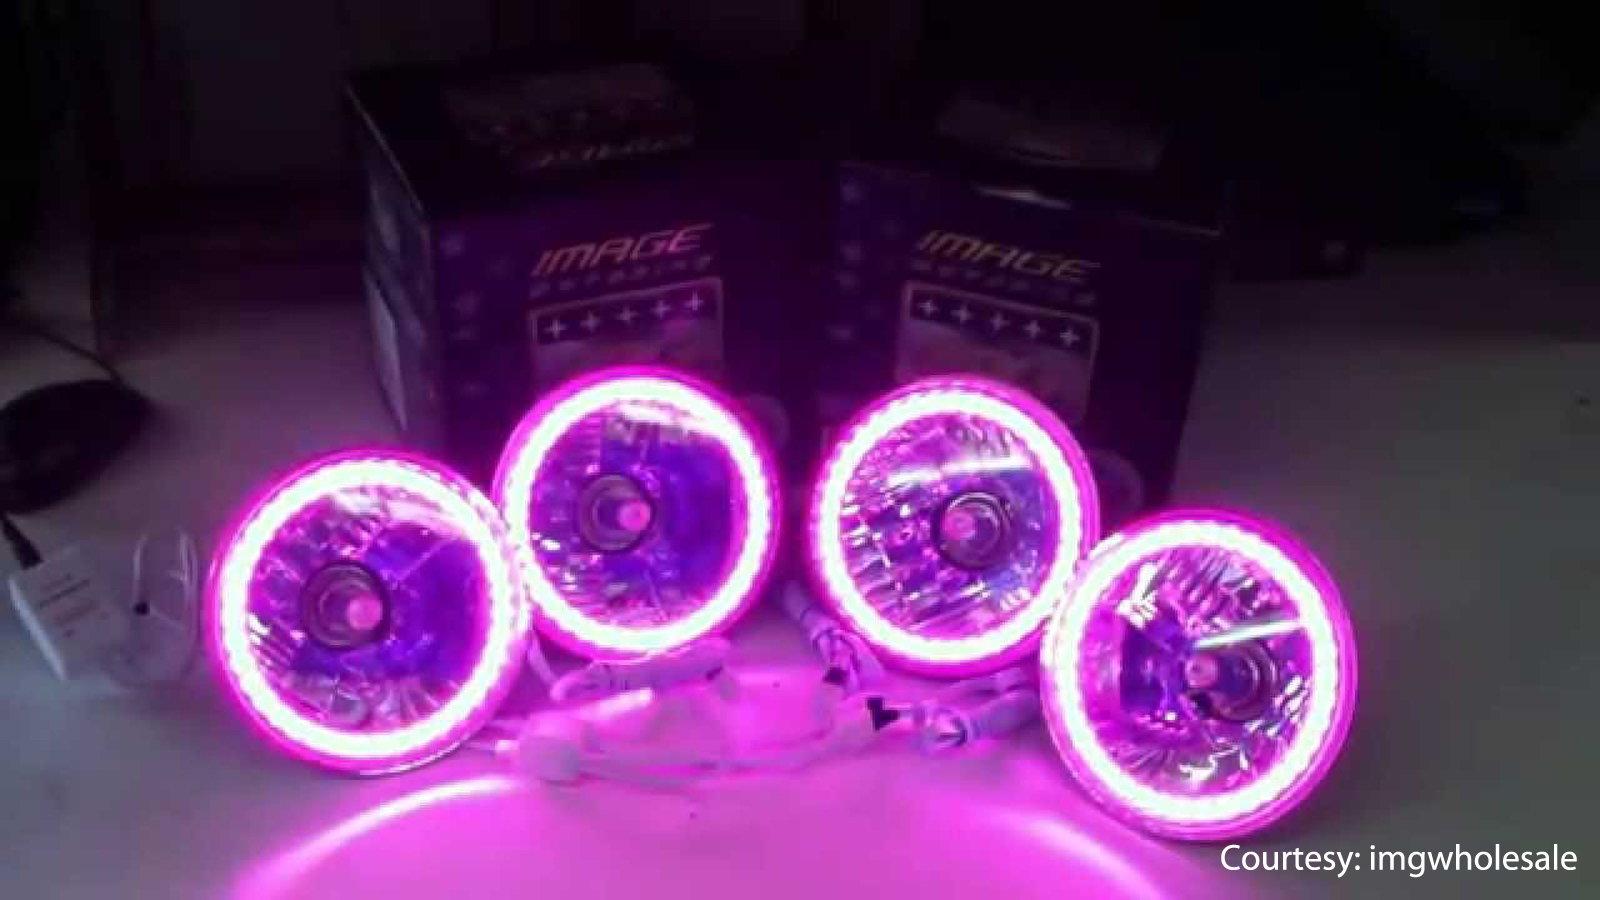 3. Halo Headlights